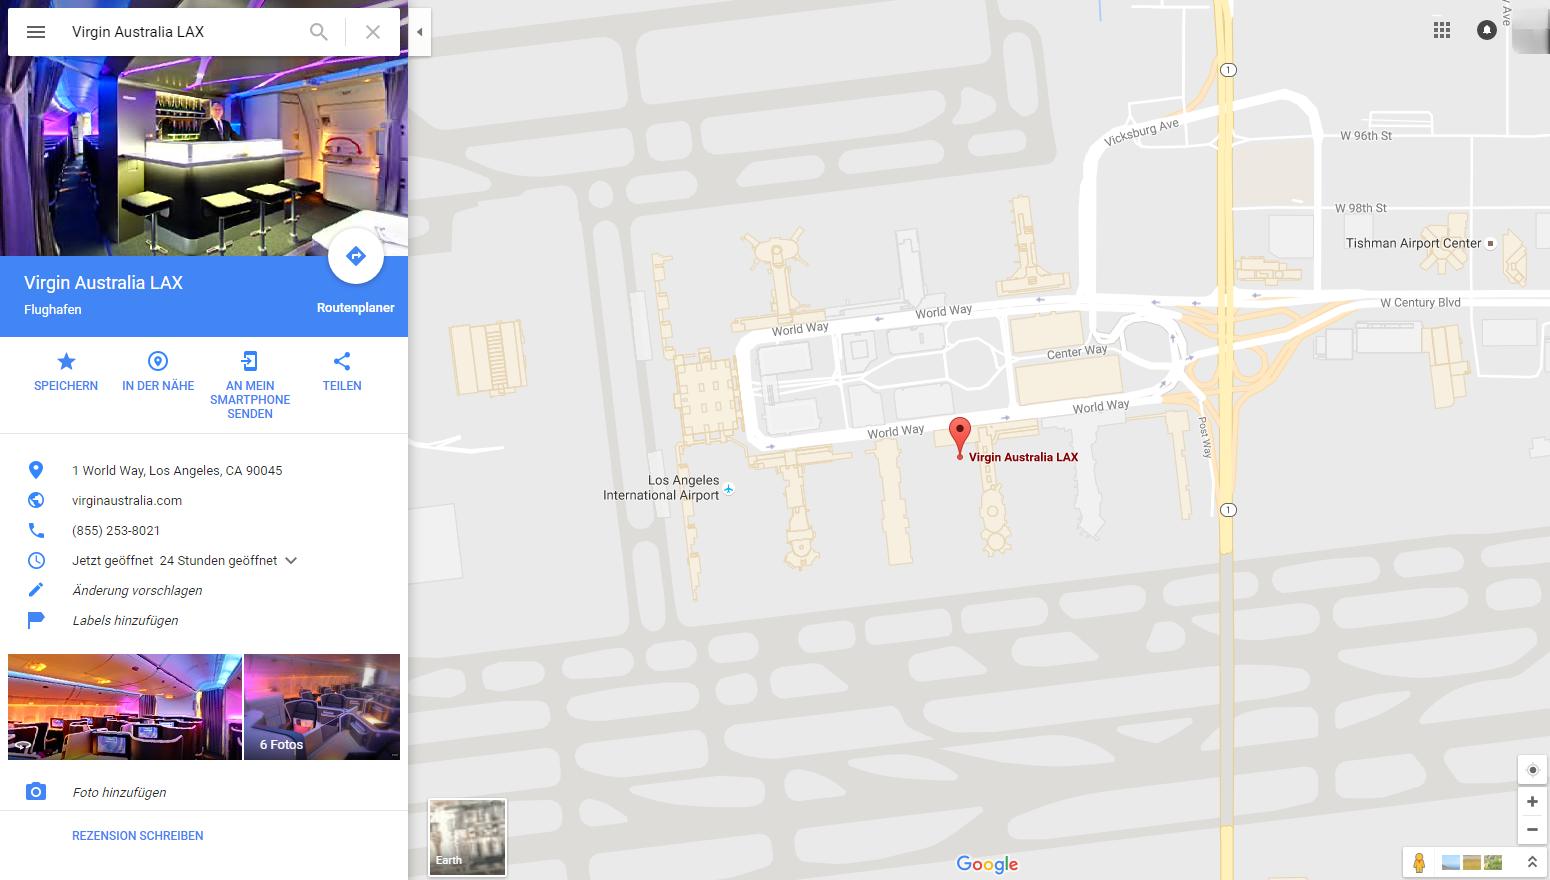 Virgin Australia LAX   Google Maps 10.png